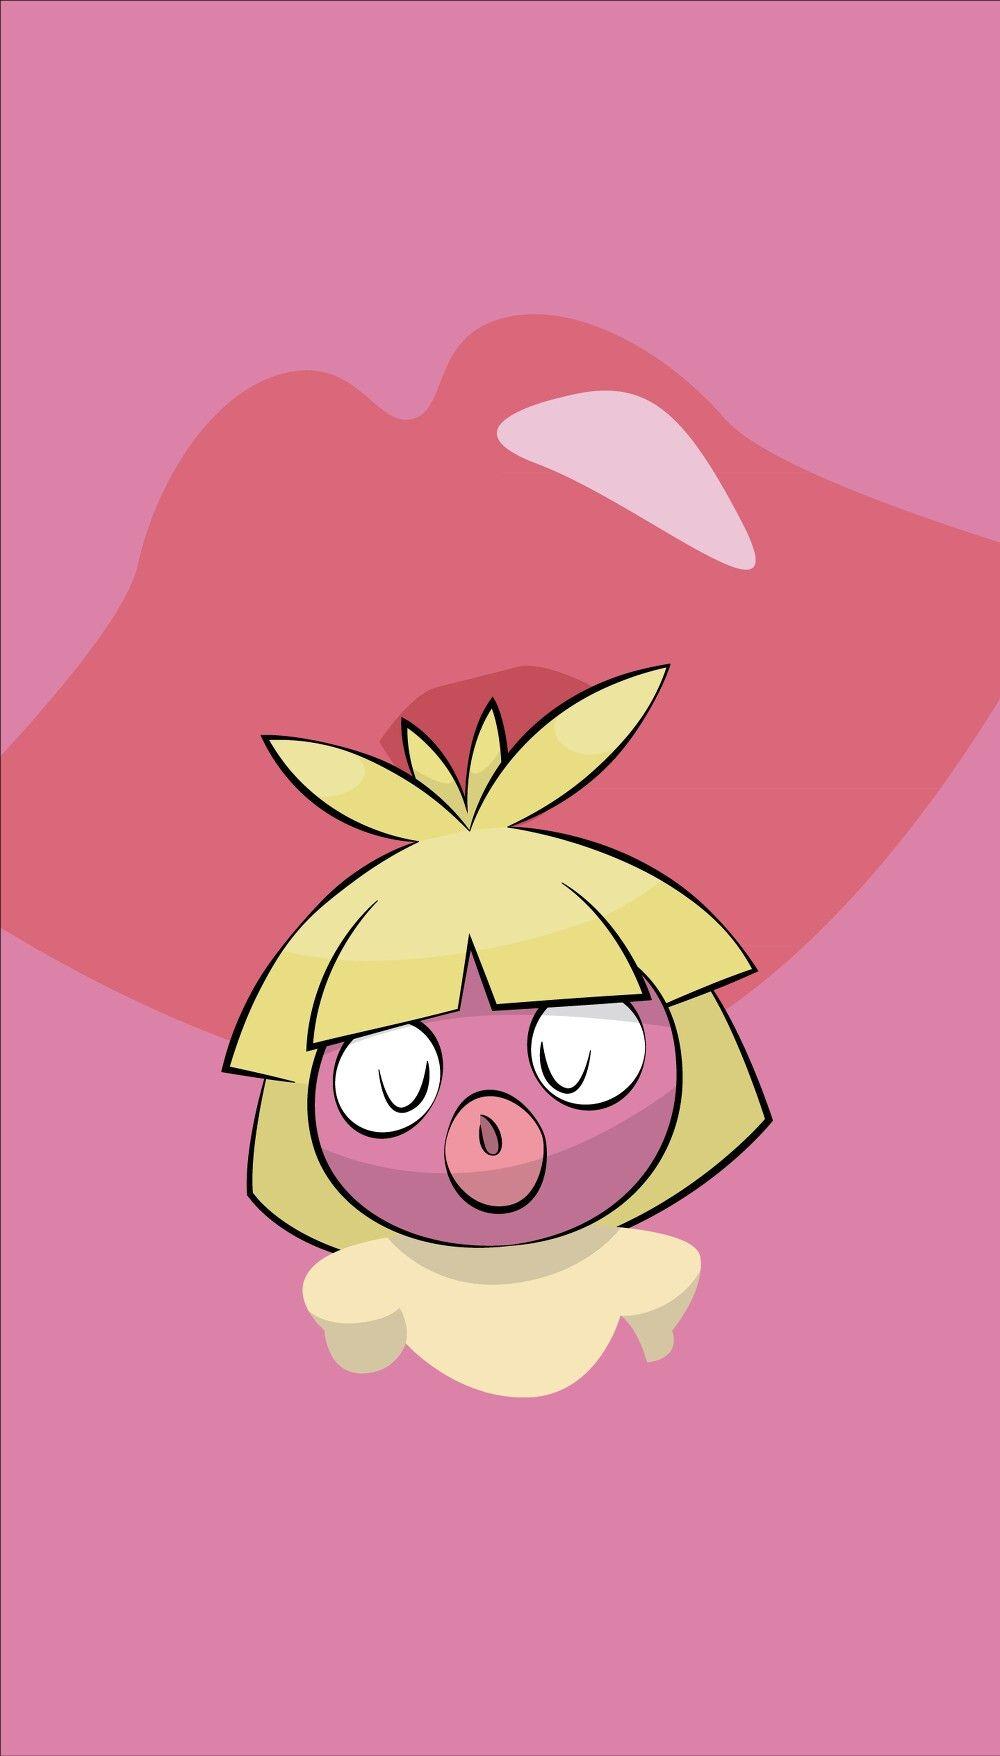 Smoochum wallpaper ❤ | Pokémon (ノ◕ヮ◕)ノ*:・゚✧ | Pinterest …